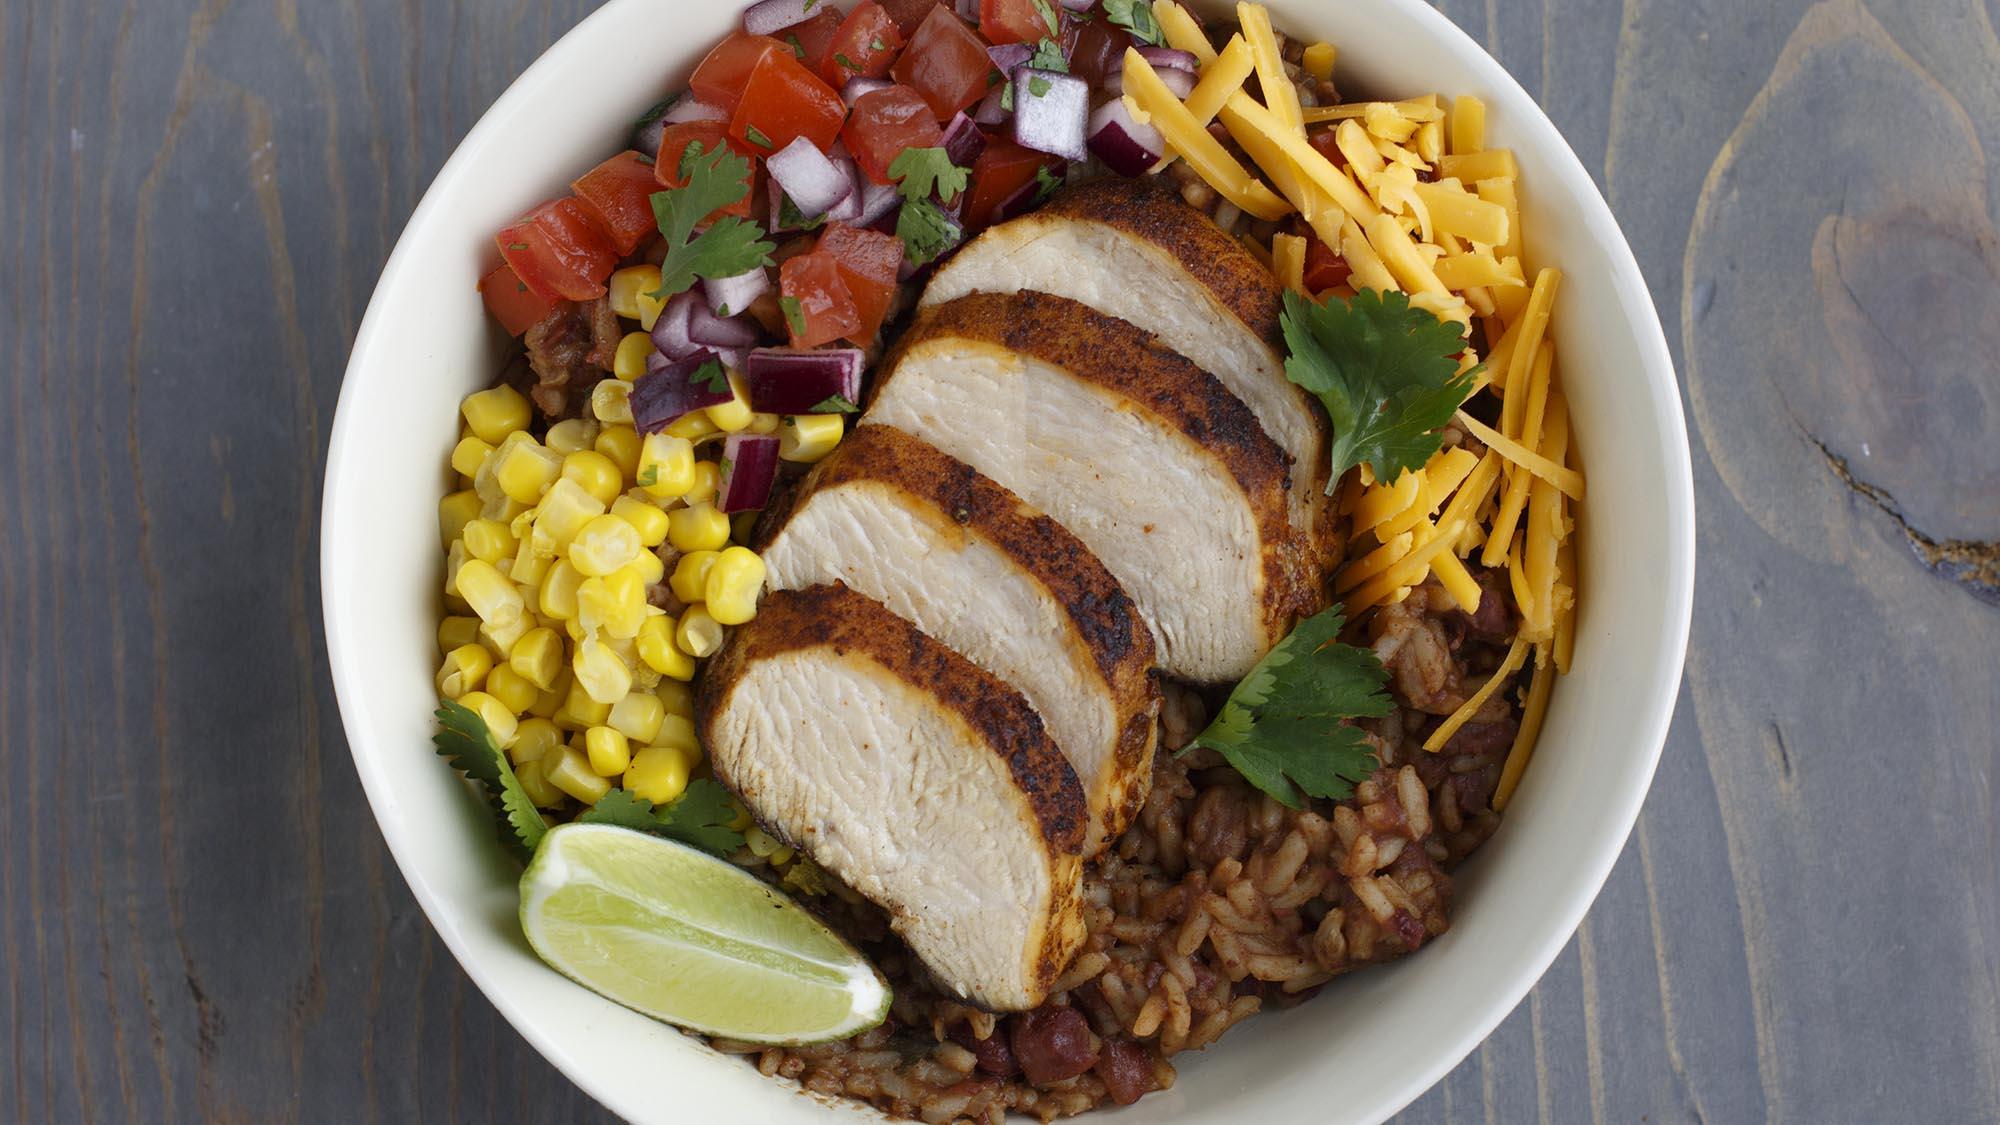 red_beans_and_rice_burrito_bowl_2000x1125.jpg